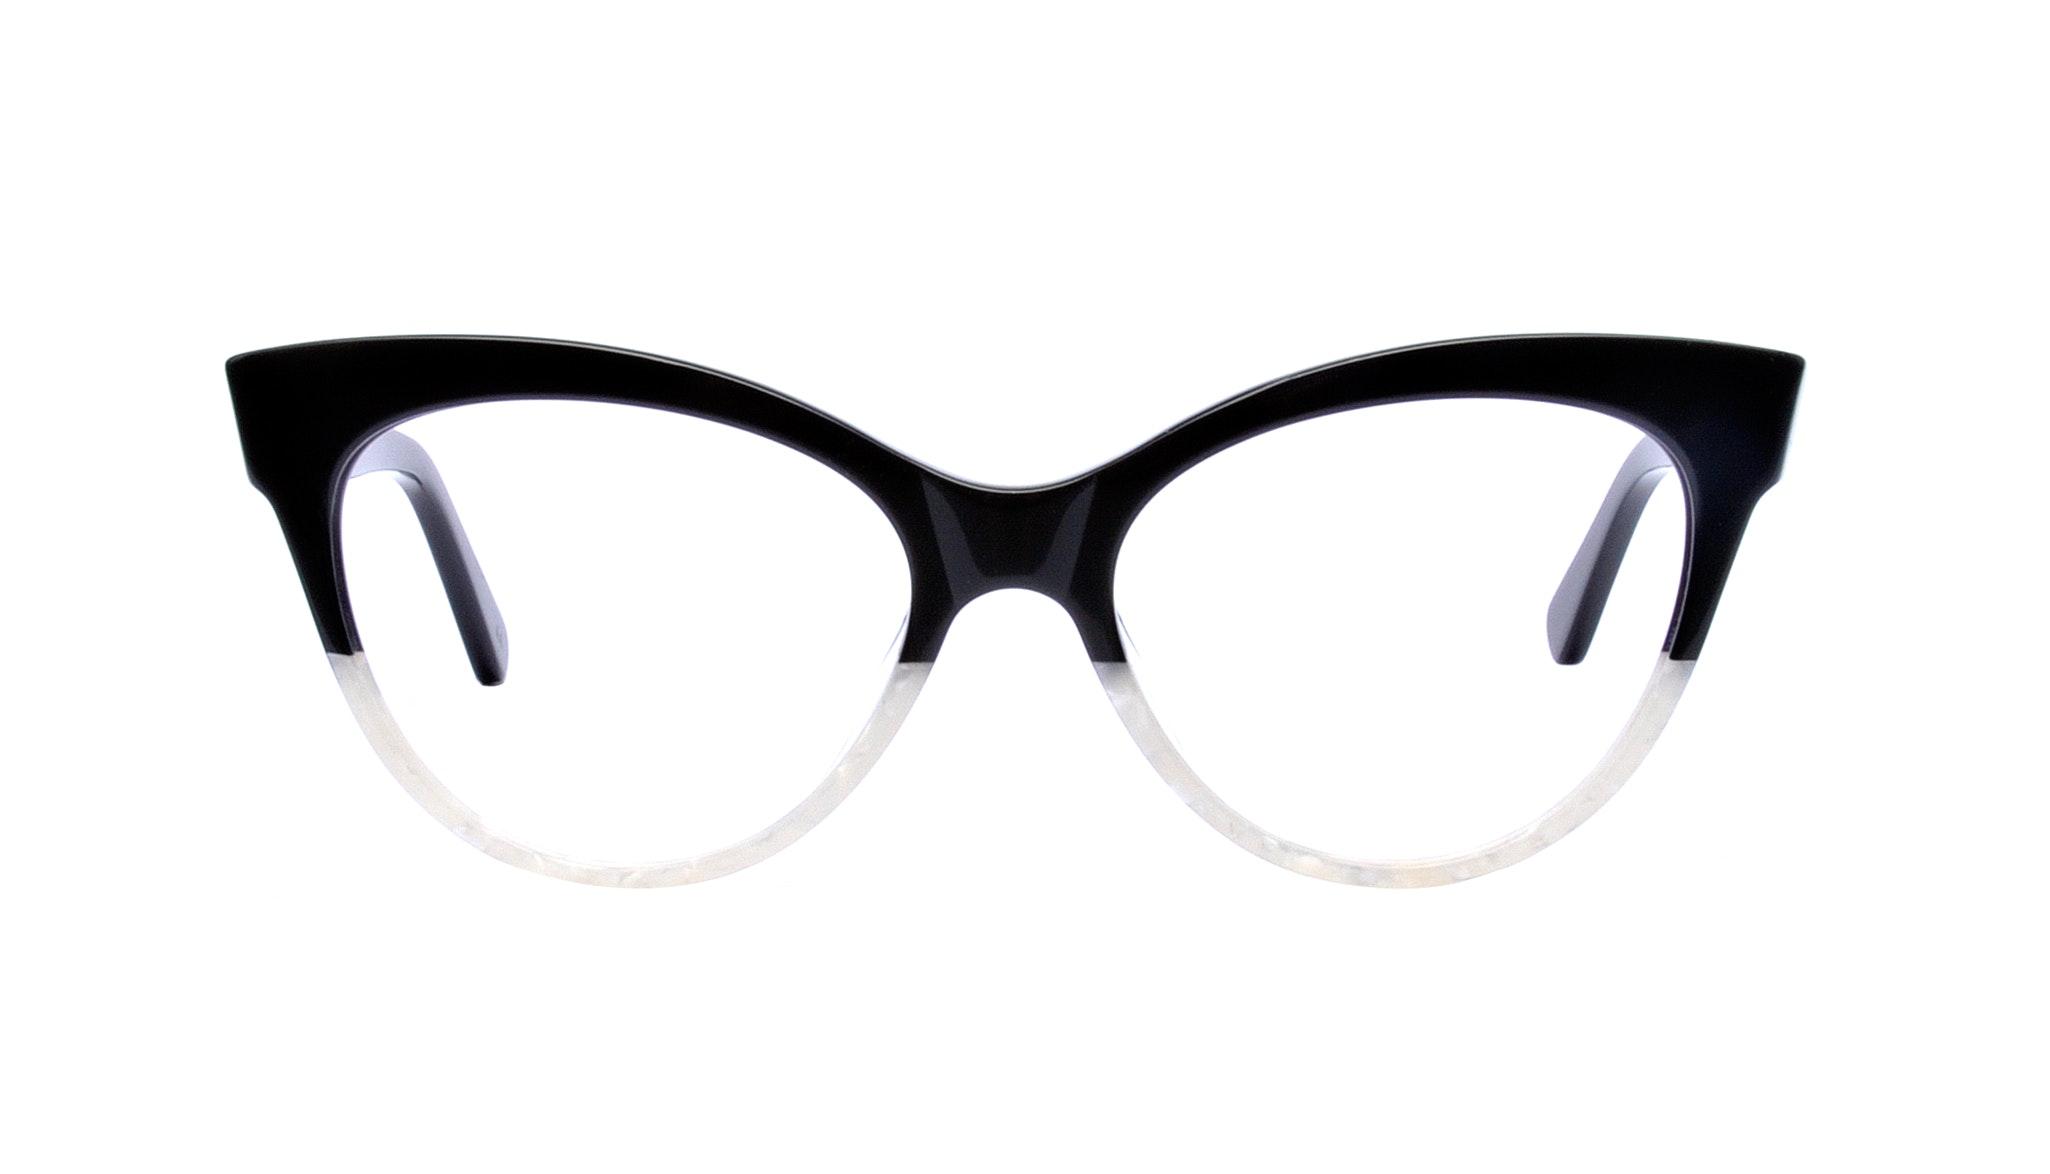 Affordable Fashion Glasses Cat Eye Eyeglasses Women SkunkBoy Panda Pearl